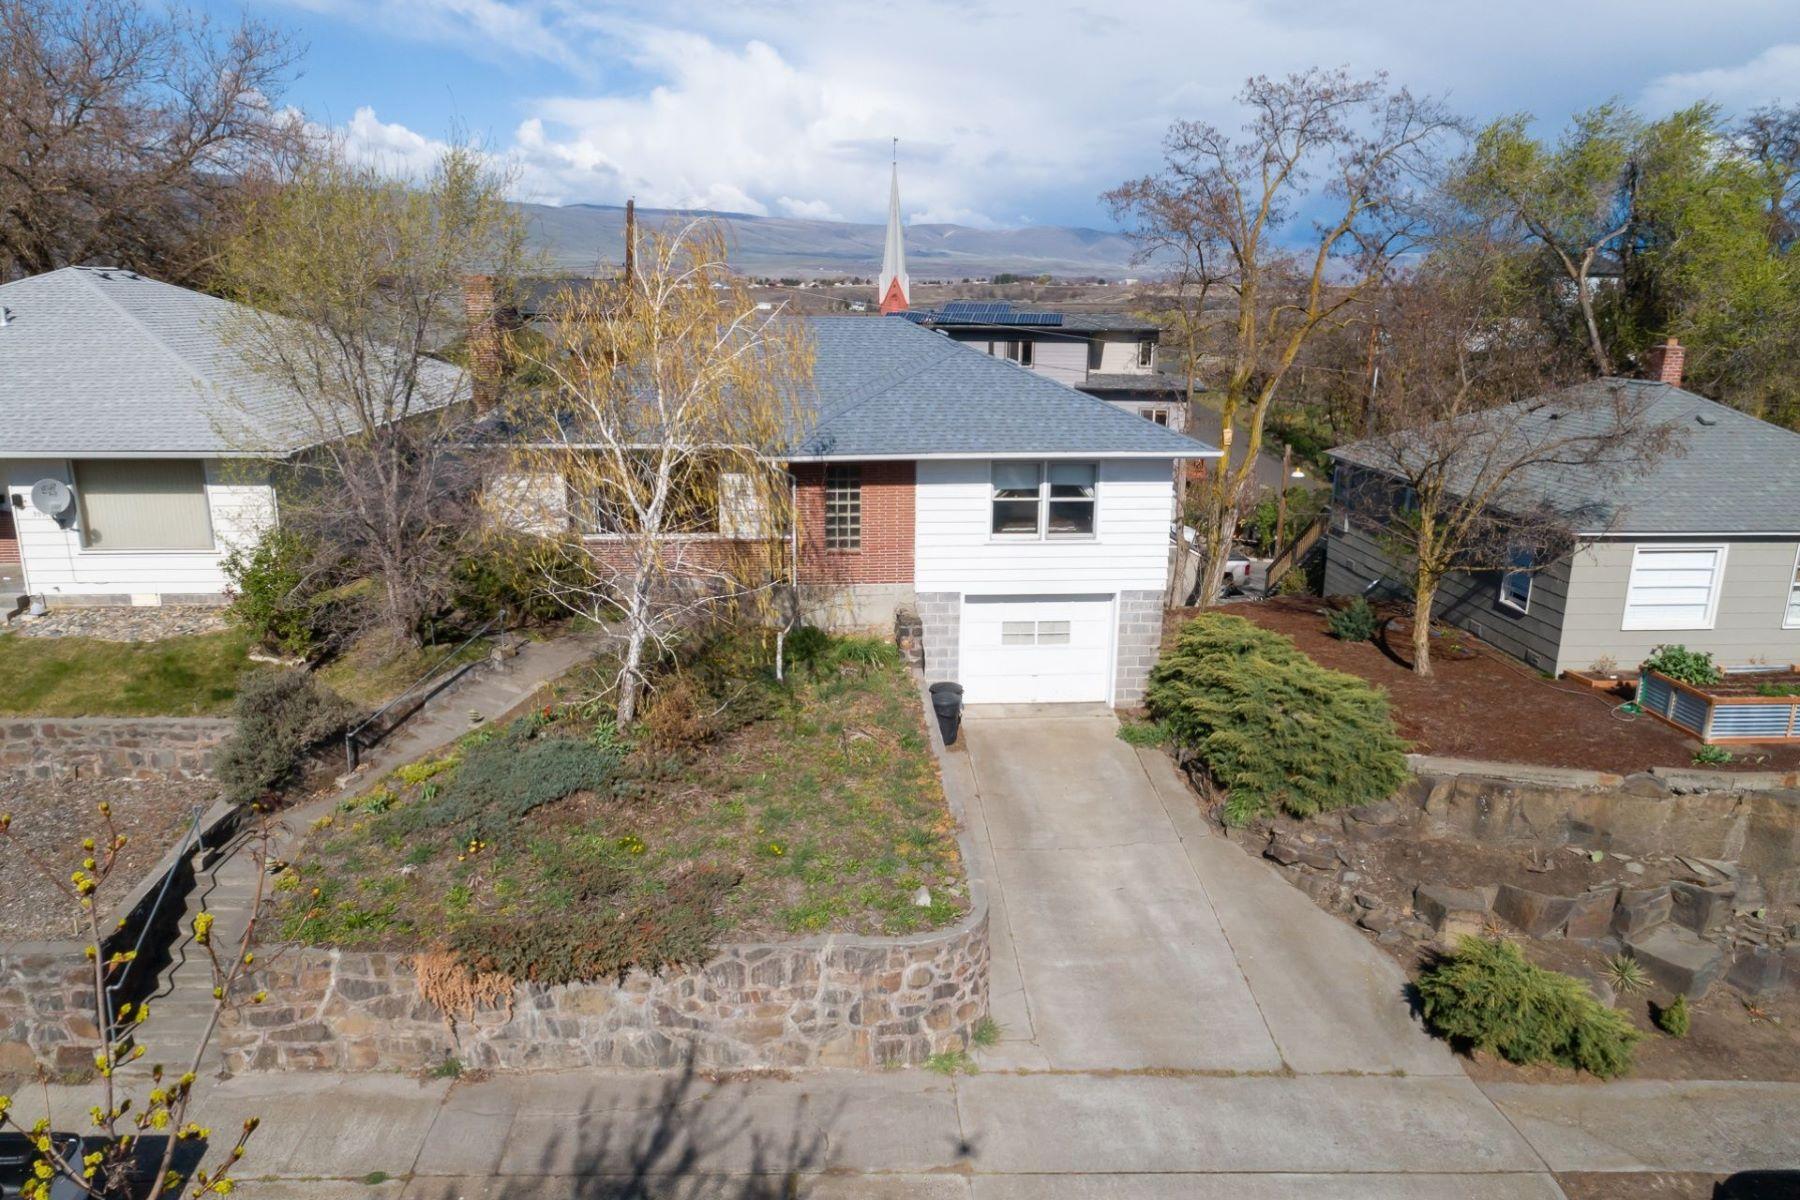 Other Residential Homes για την Πώληση στο 307 W 6TH The Dalles, OR 97058 The Dalles, Ορεγκον 97058 Ηνωμένες Πολιτείες